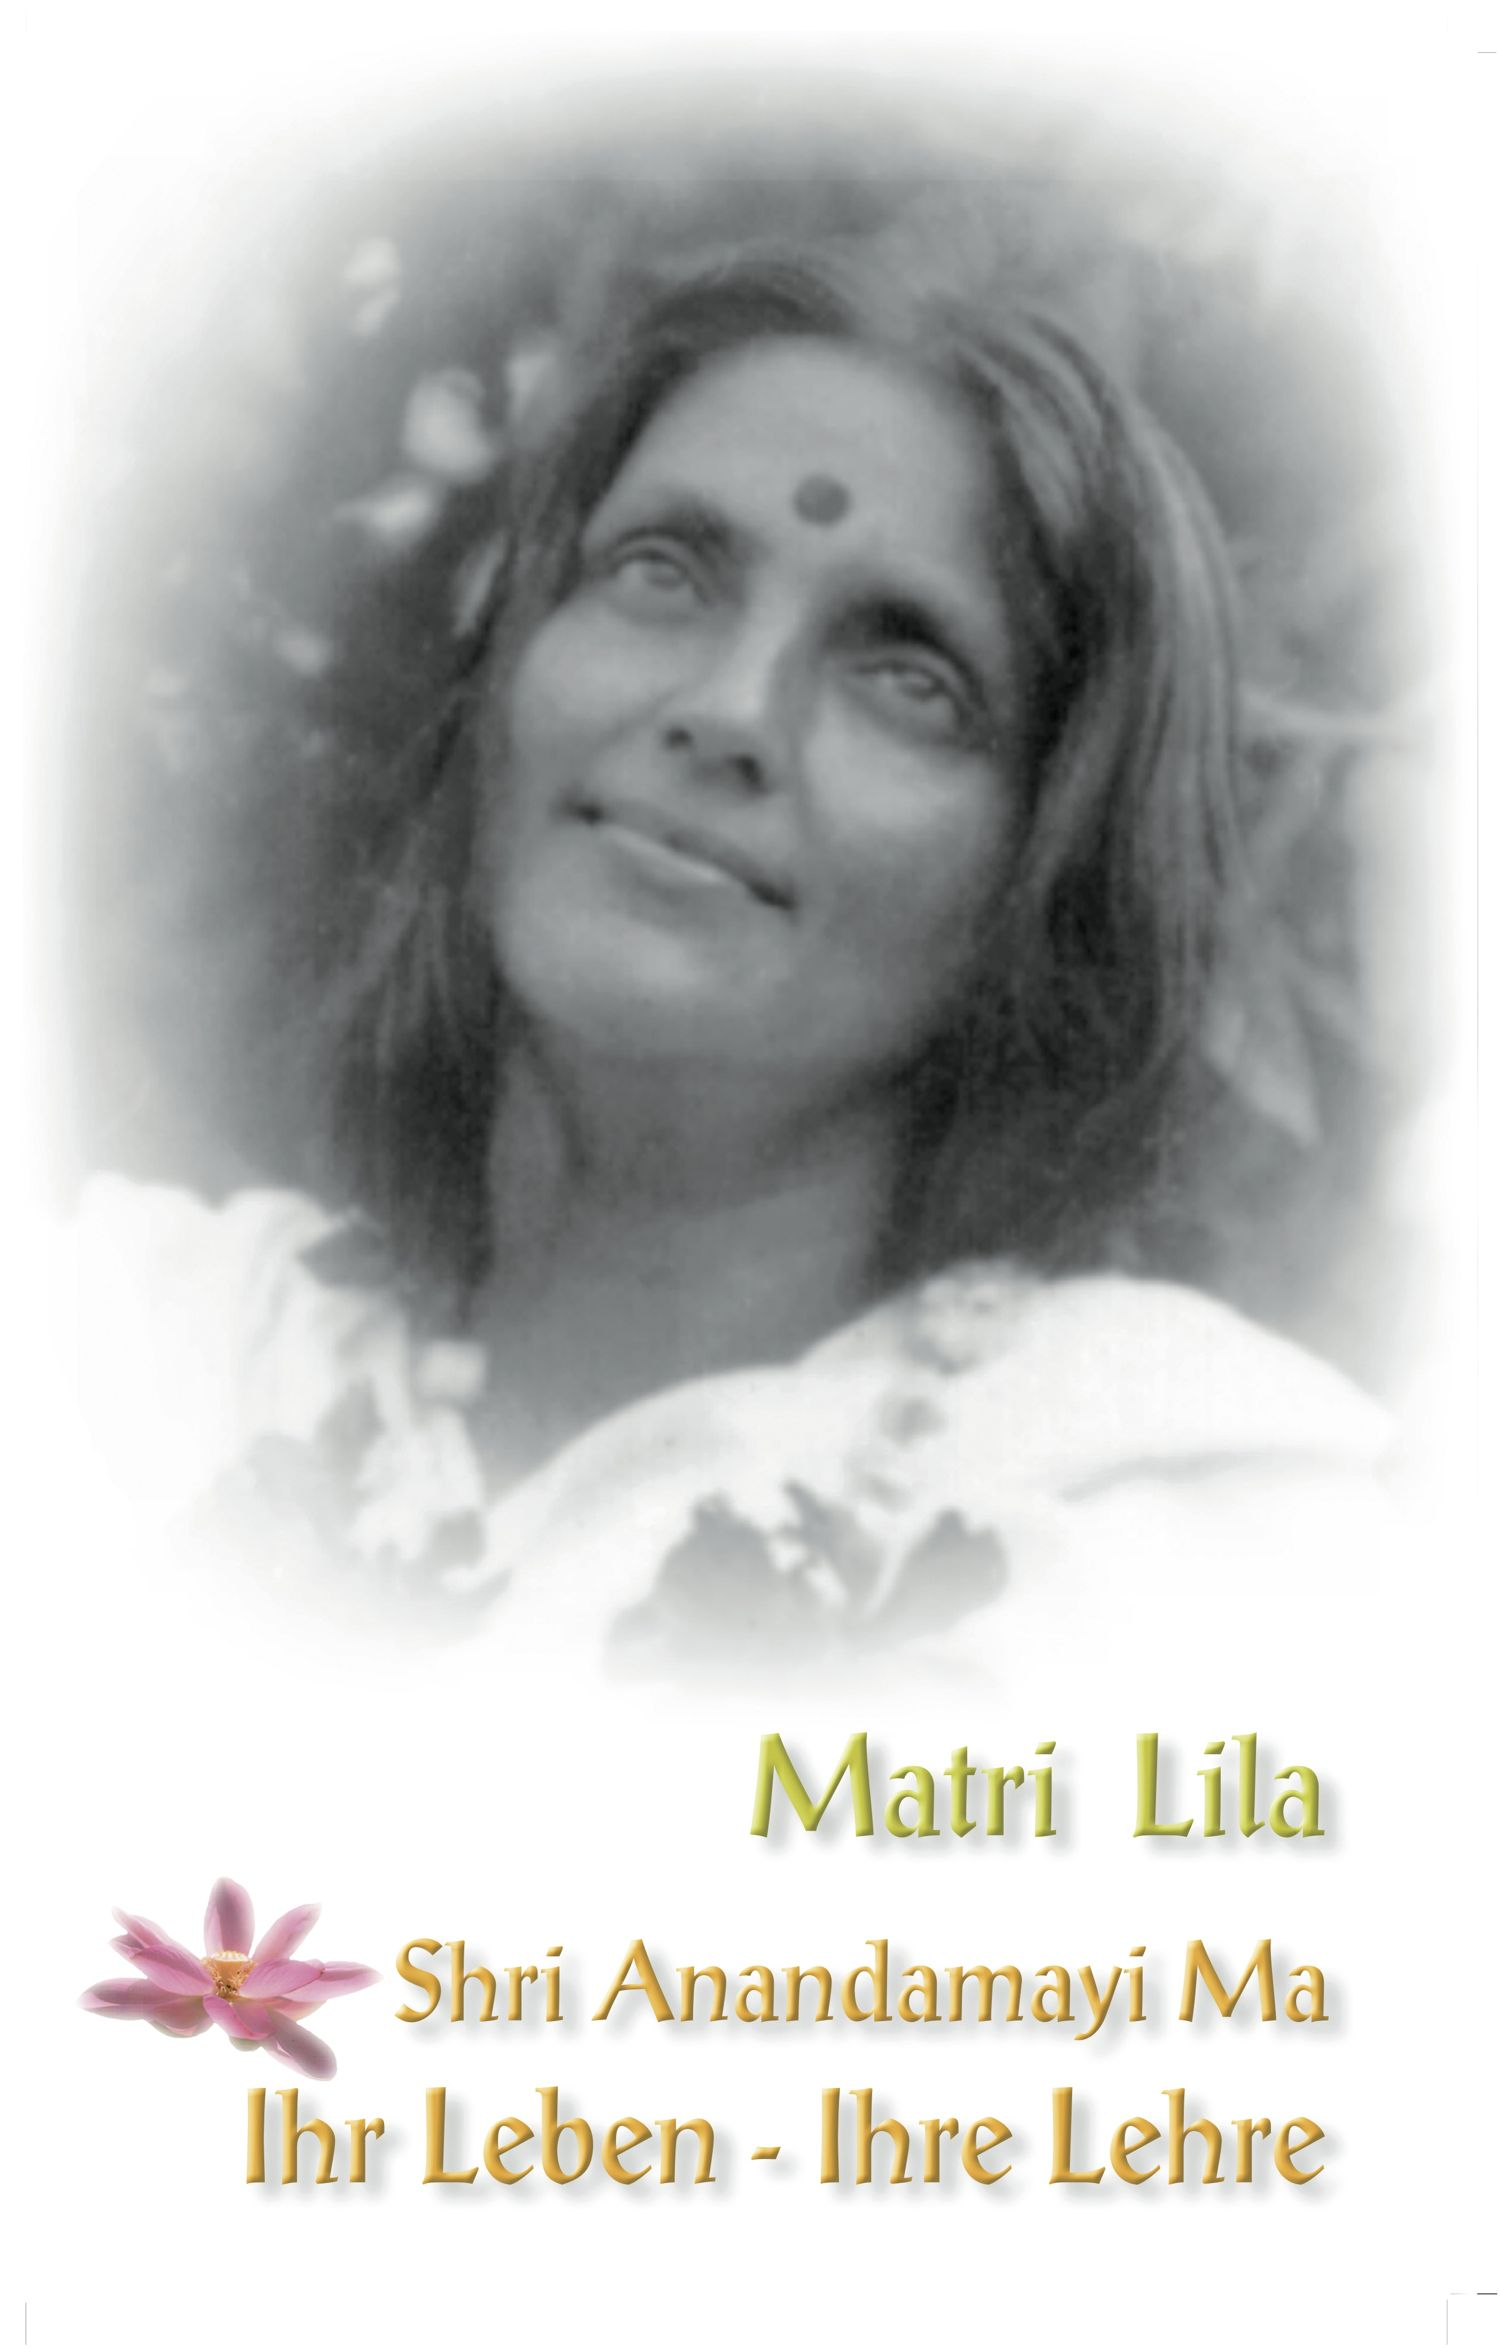 bithika mukerji - matri lila - leben und lehre von anandamayi ma, Hause ideen